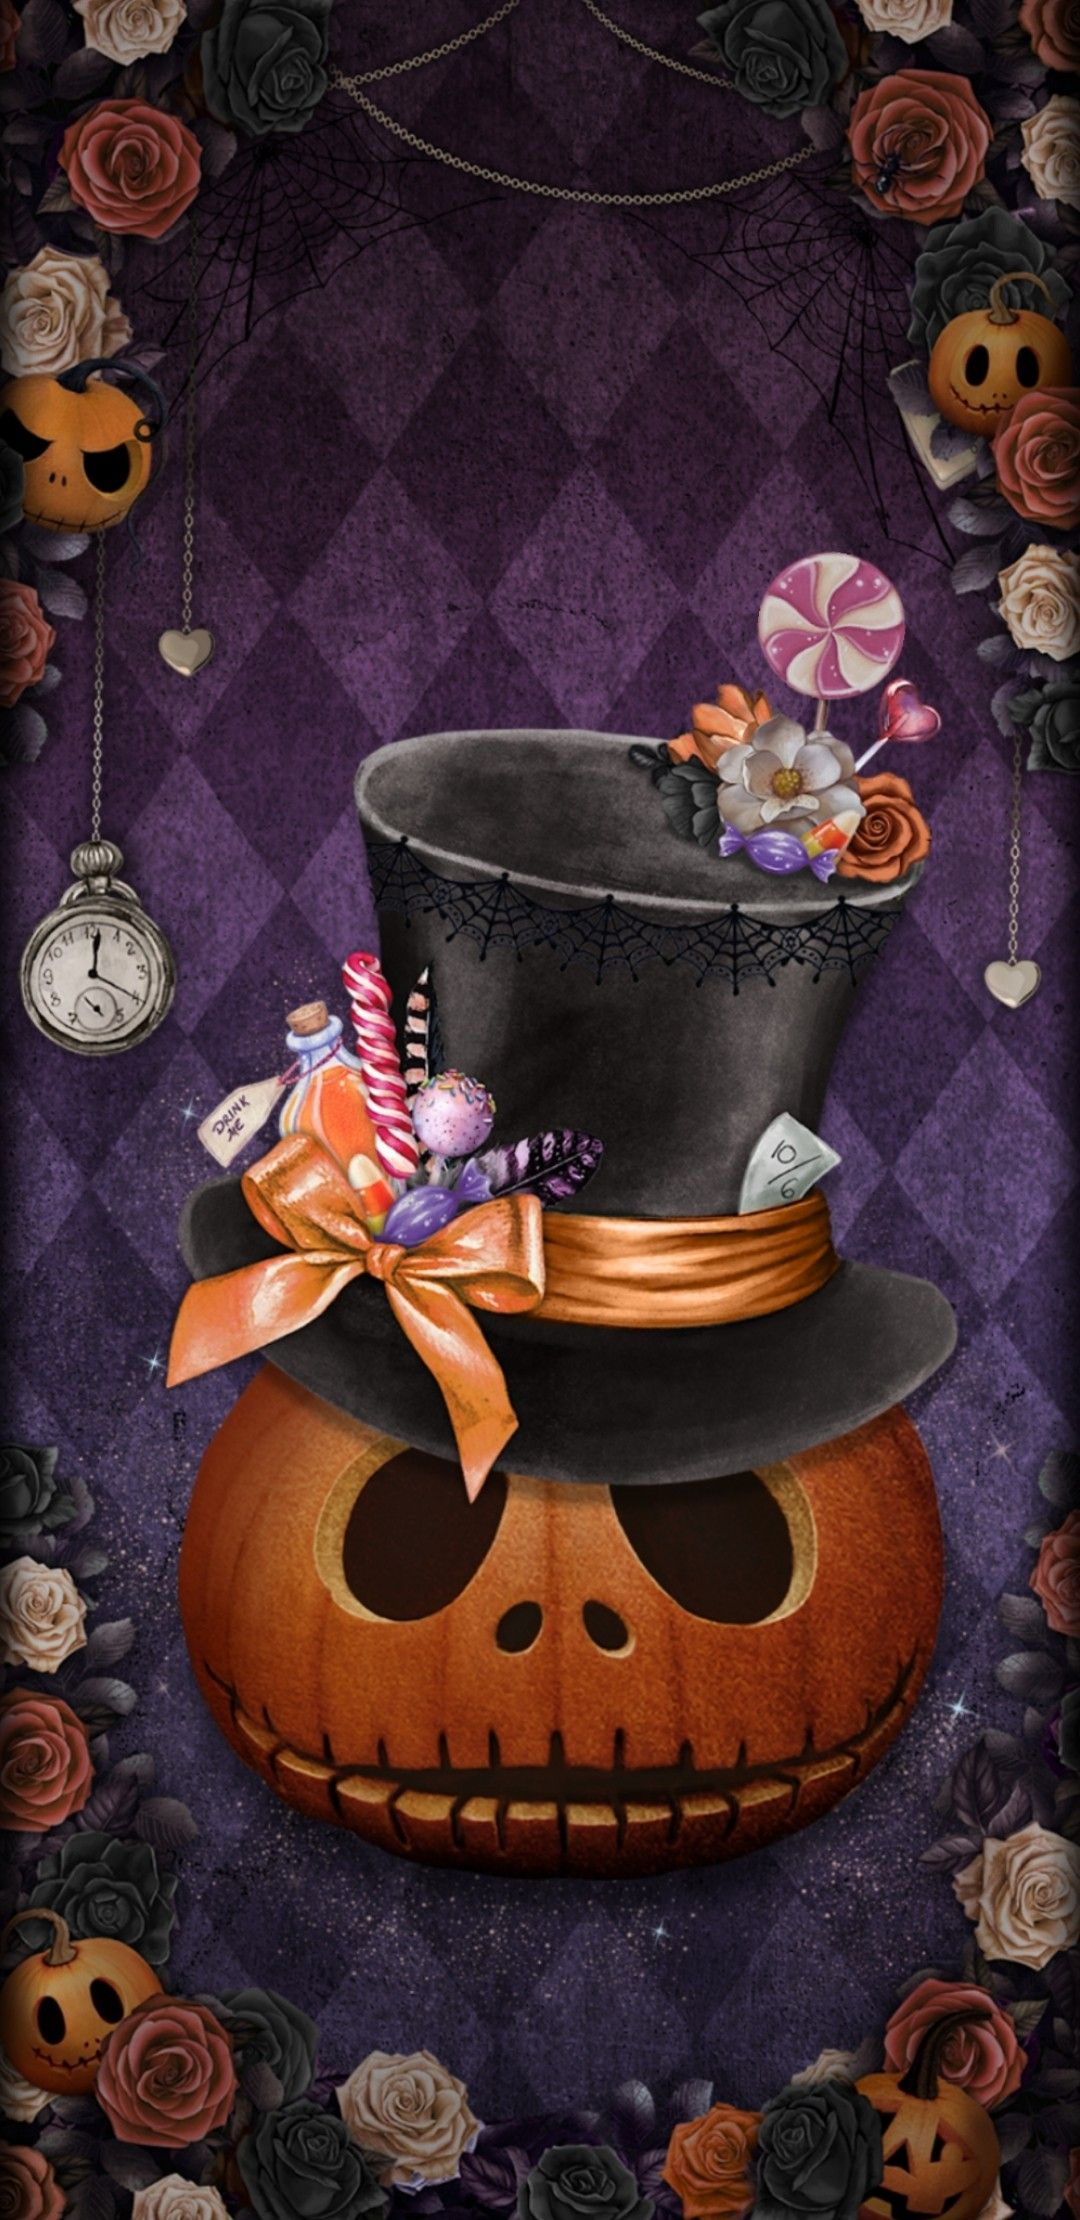 Wallpaper lockscreen Iphone android Halloween wallpaper